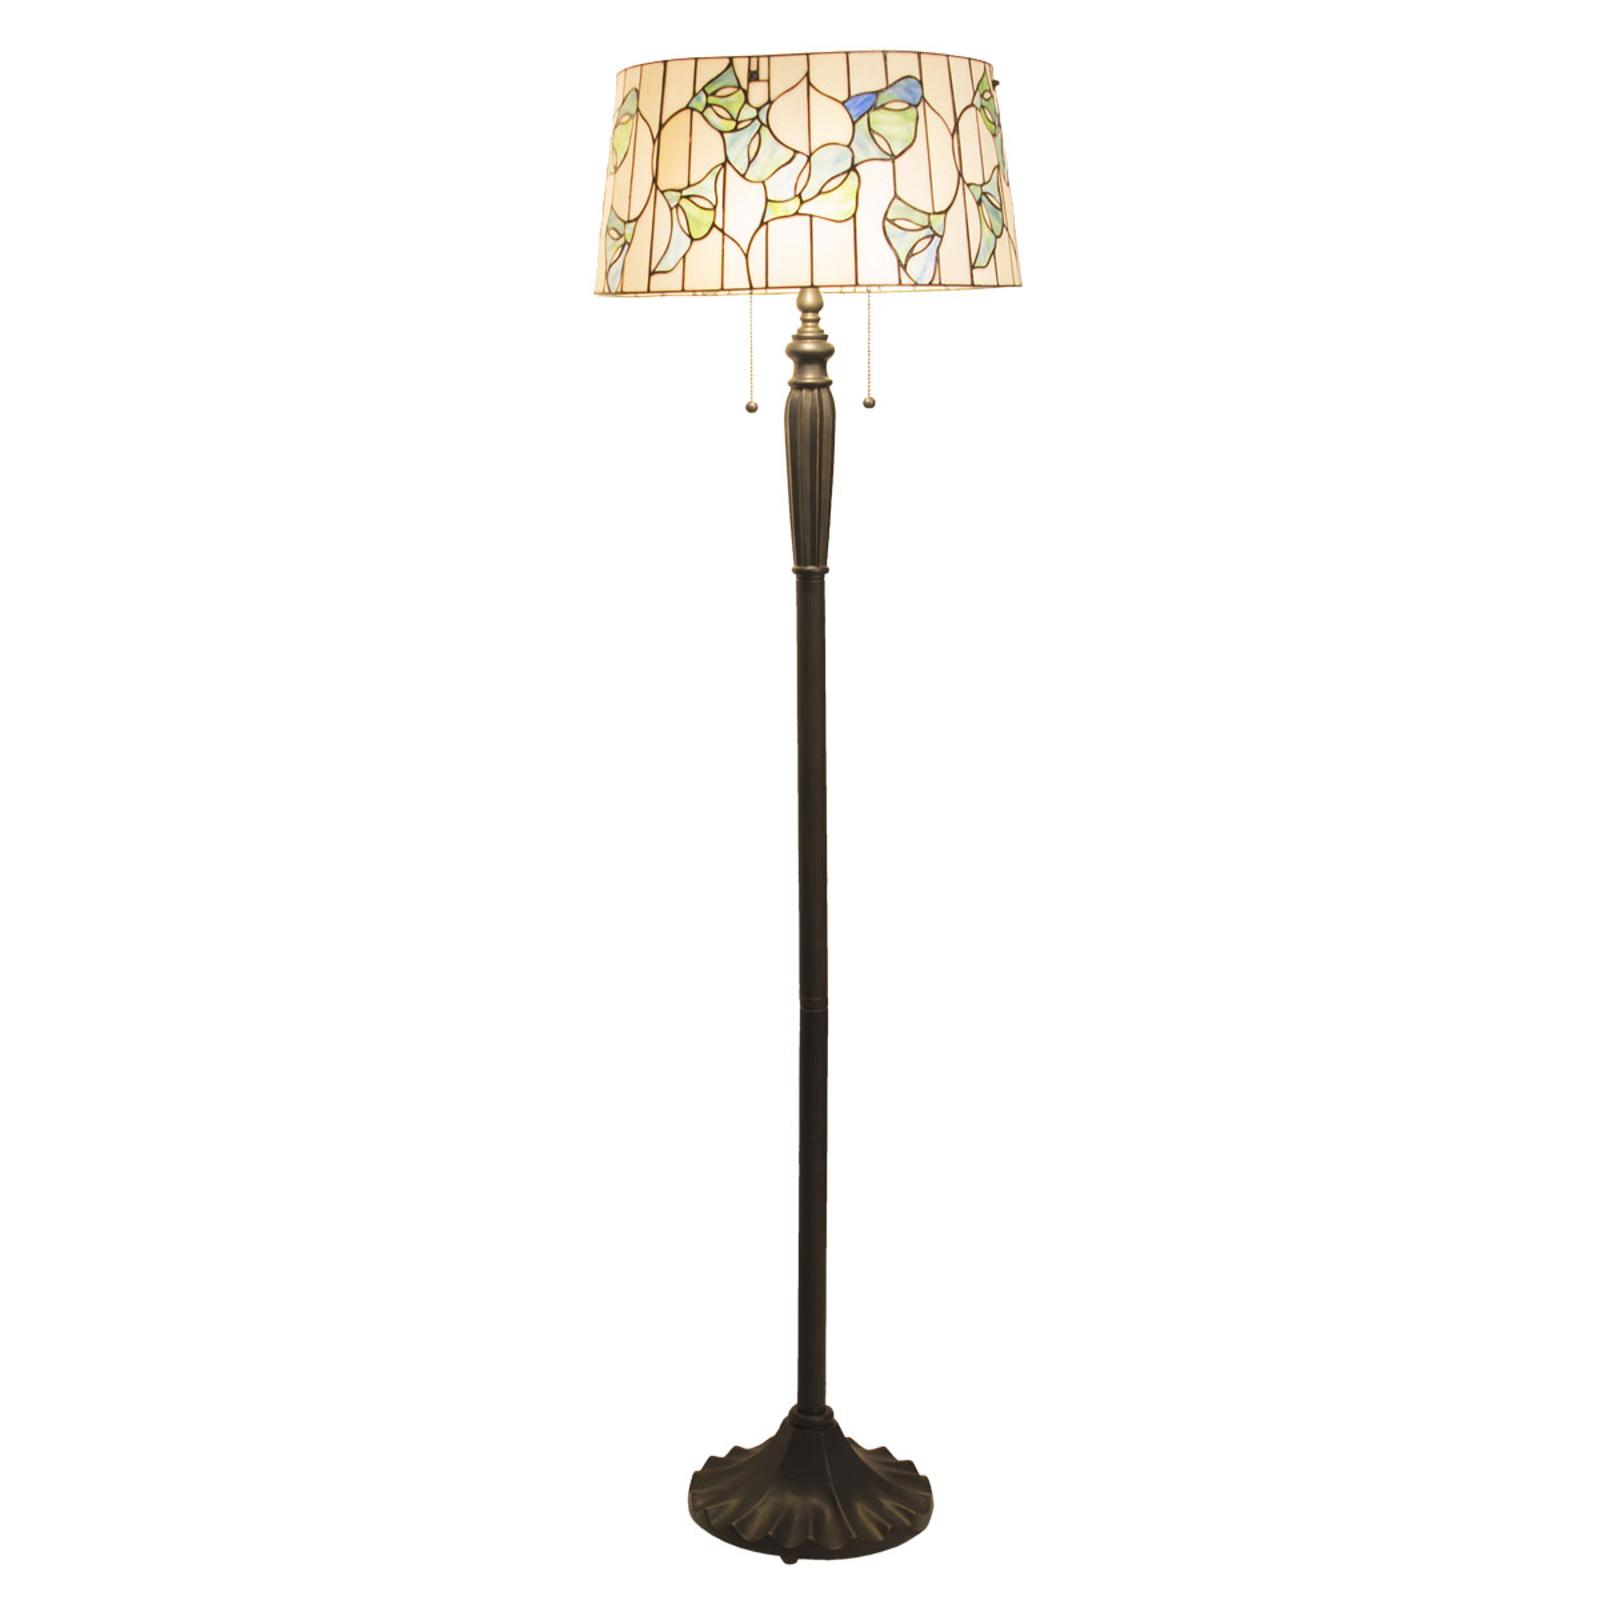 Vloerlamp 5944 met cilinderkap, Tiffany-stijl